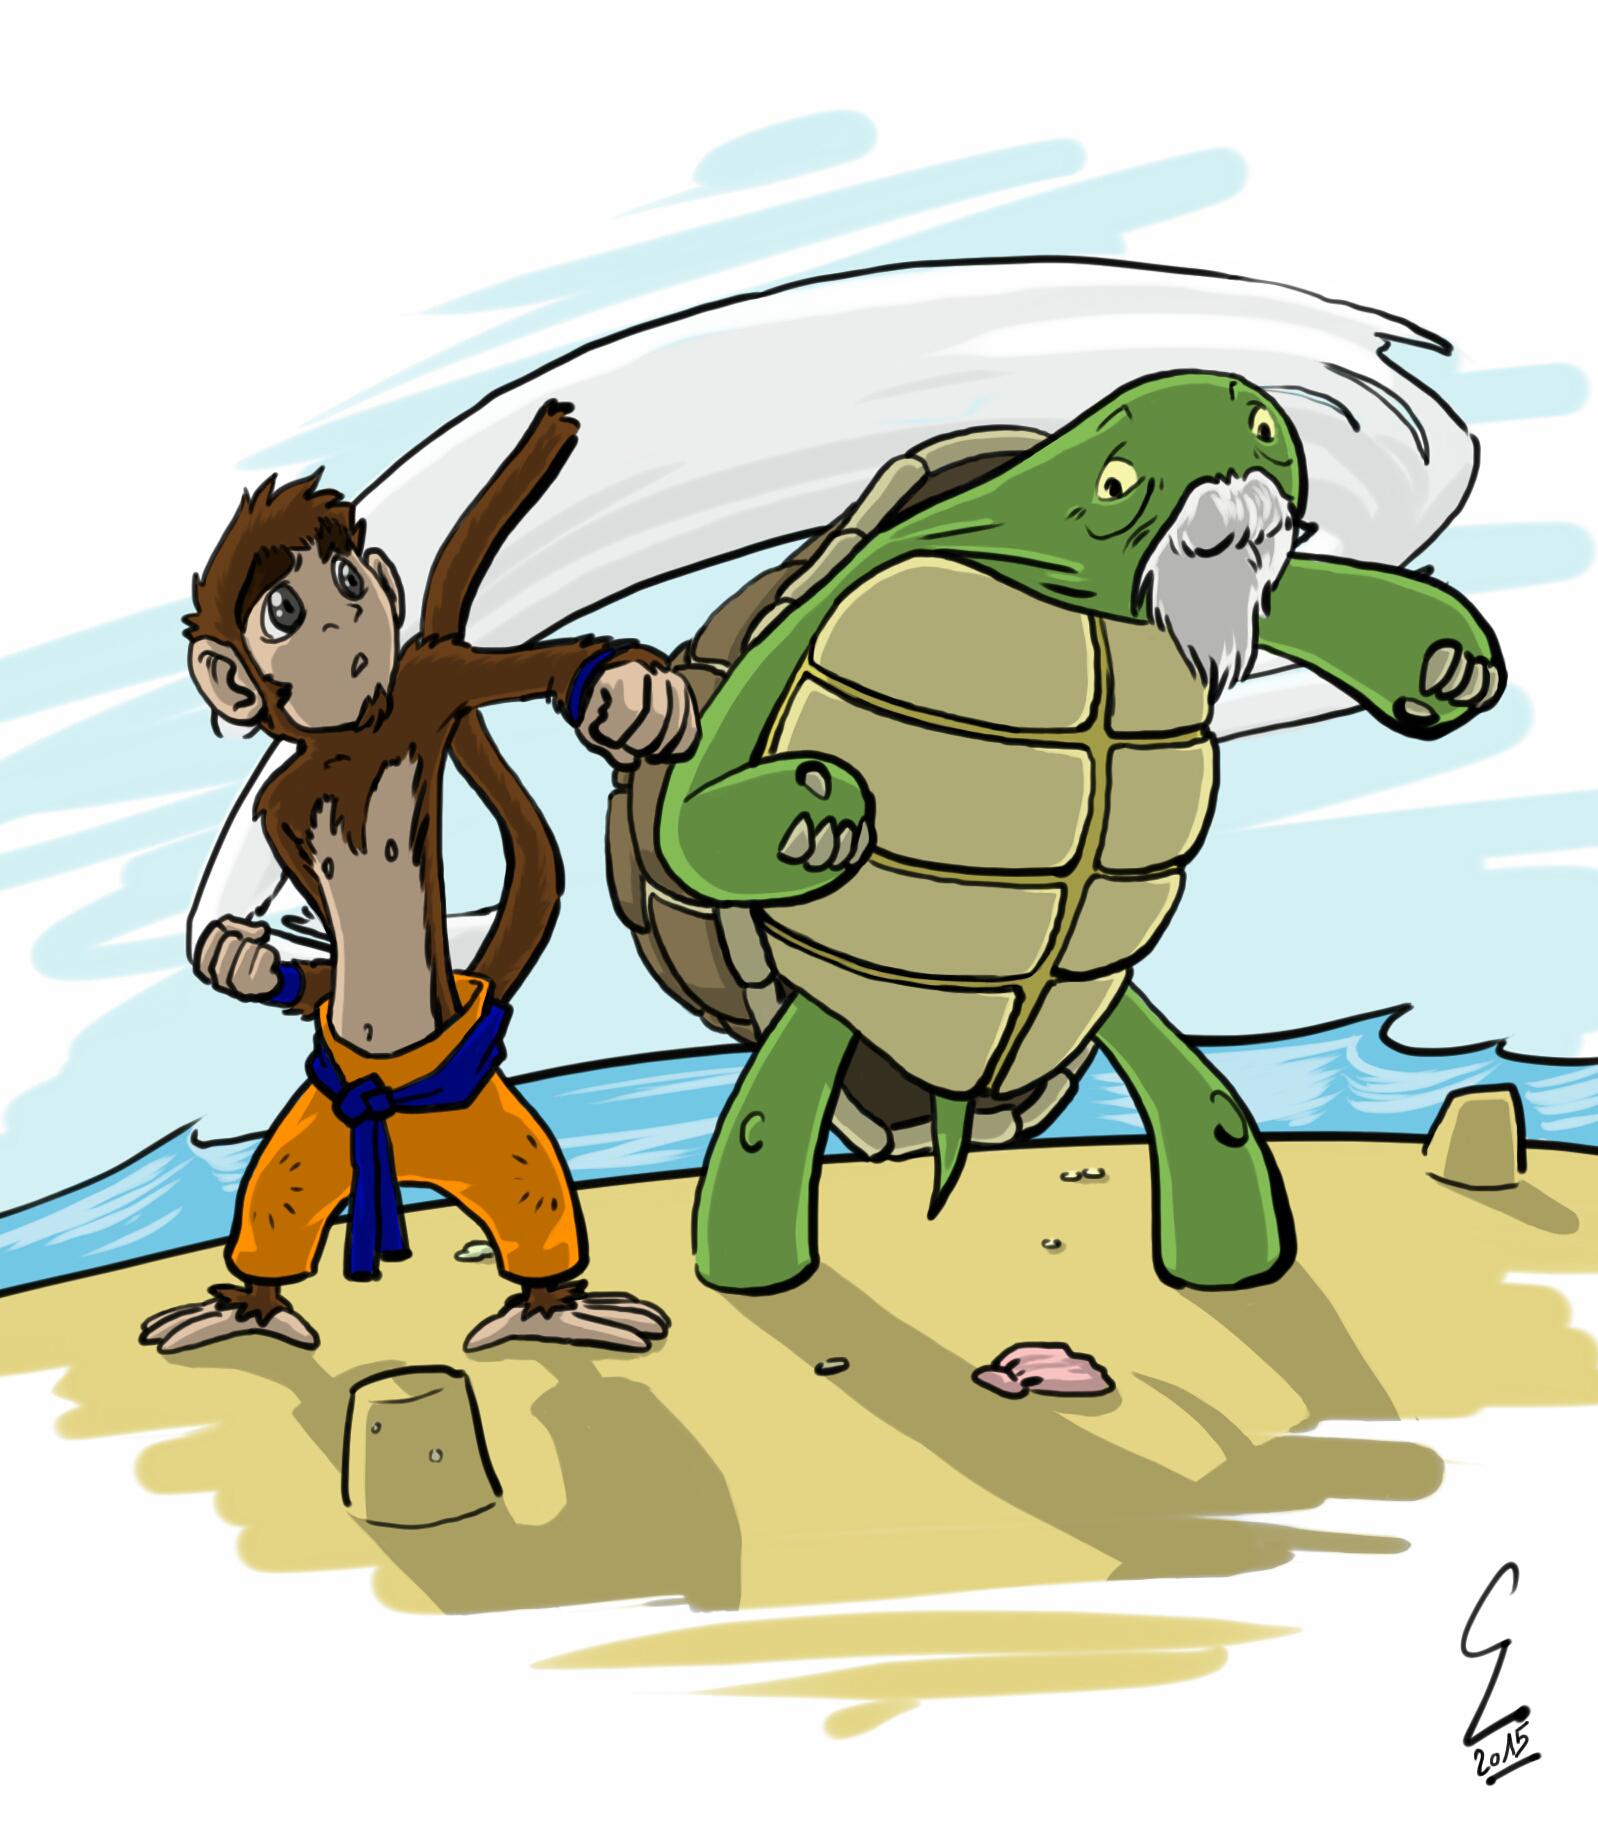 The Monkey and the Turtle by Kurisisu